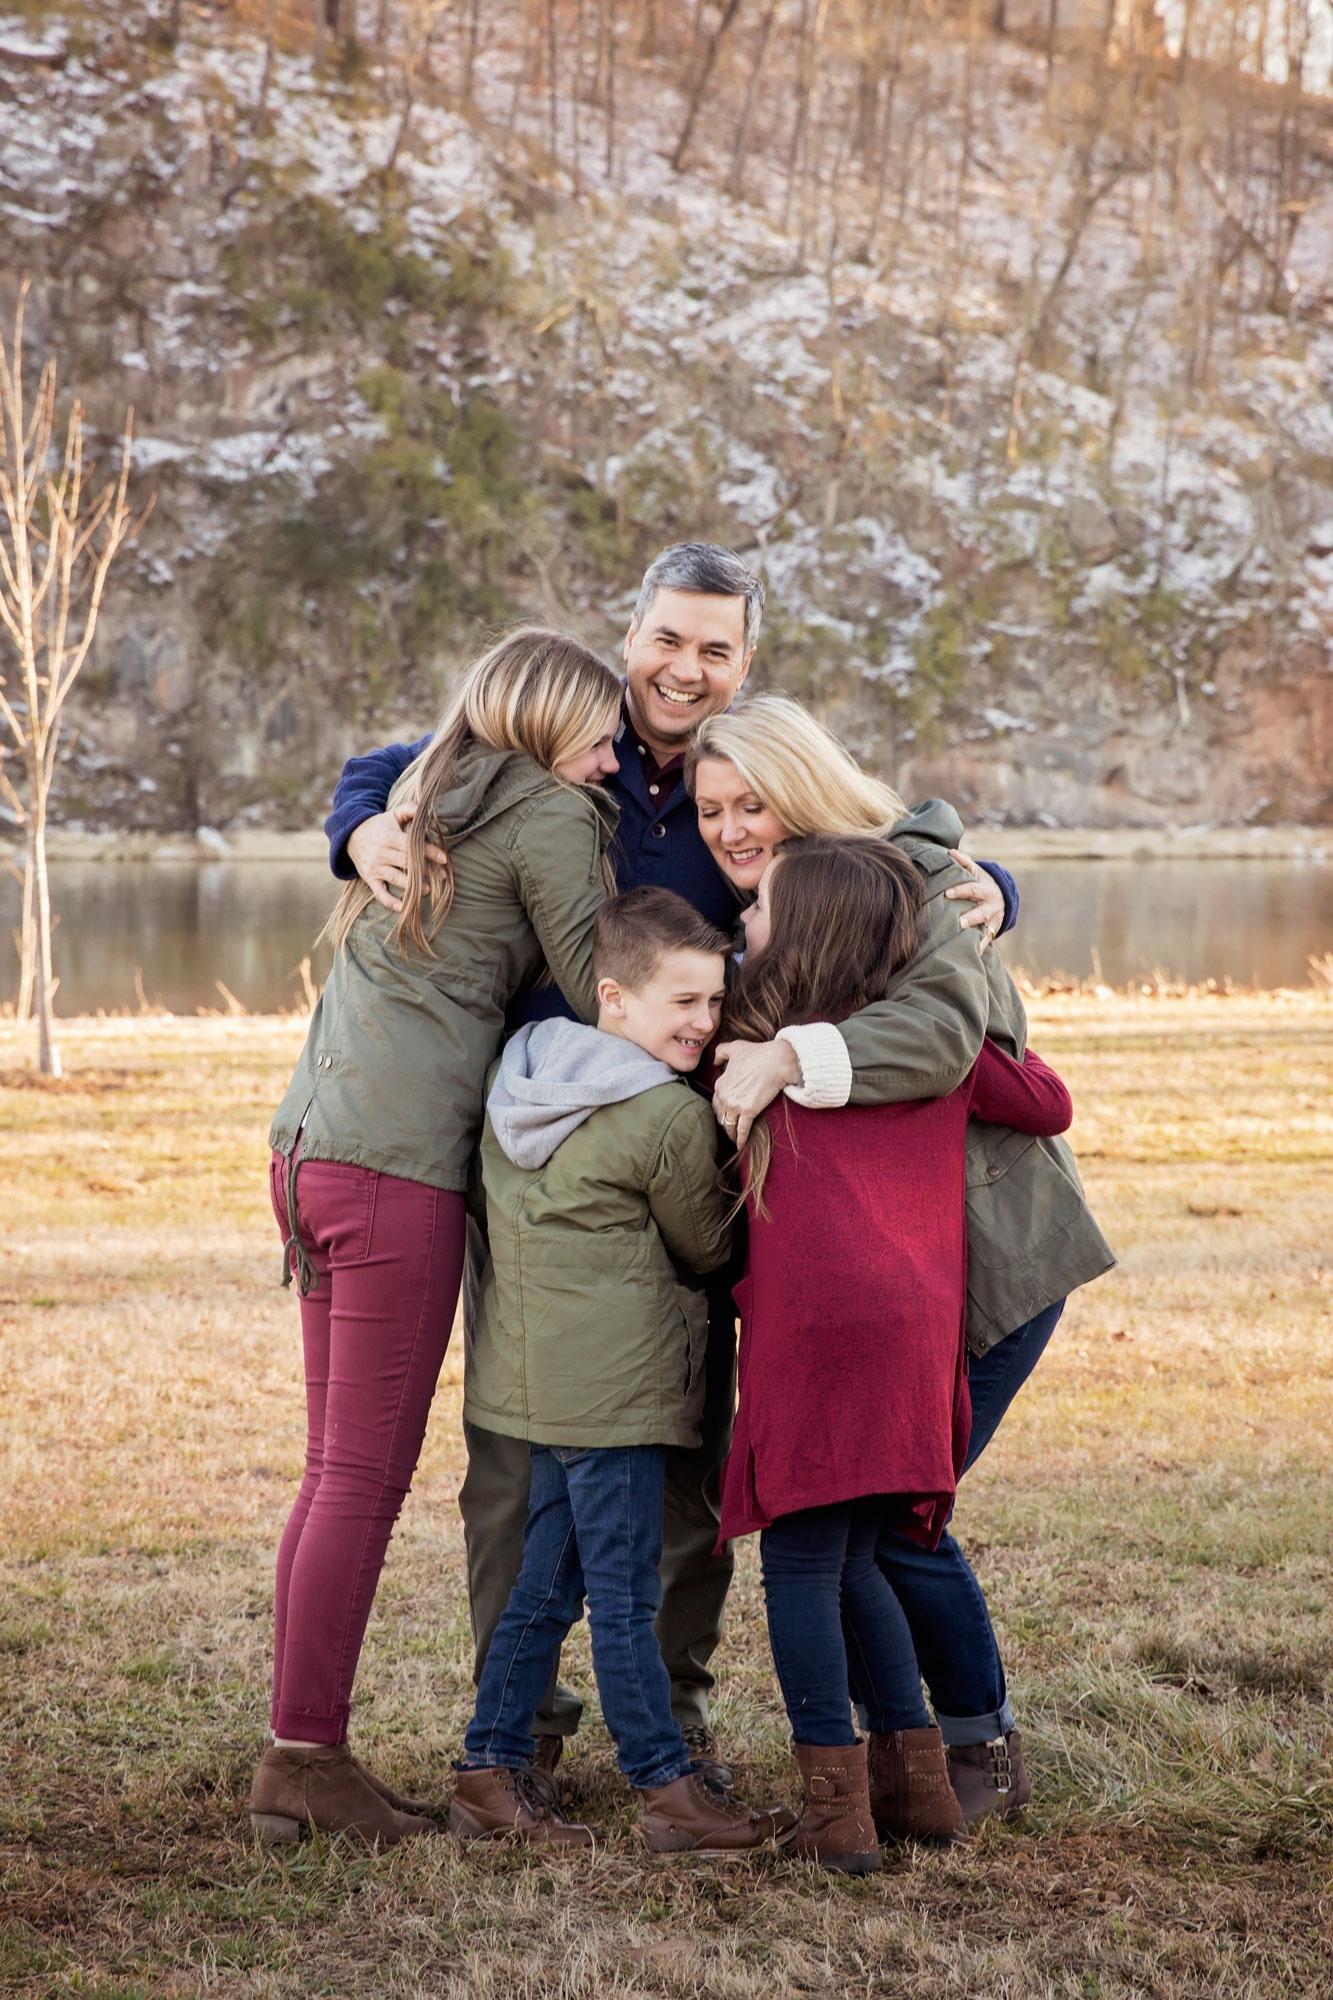 gatlinburg-family-photographer-grandparents-hug.jpg